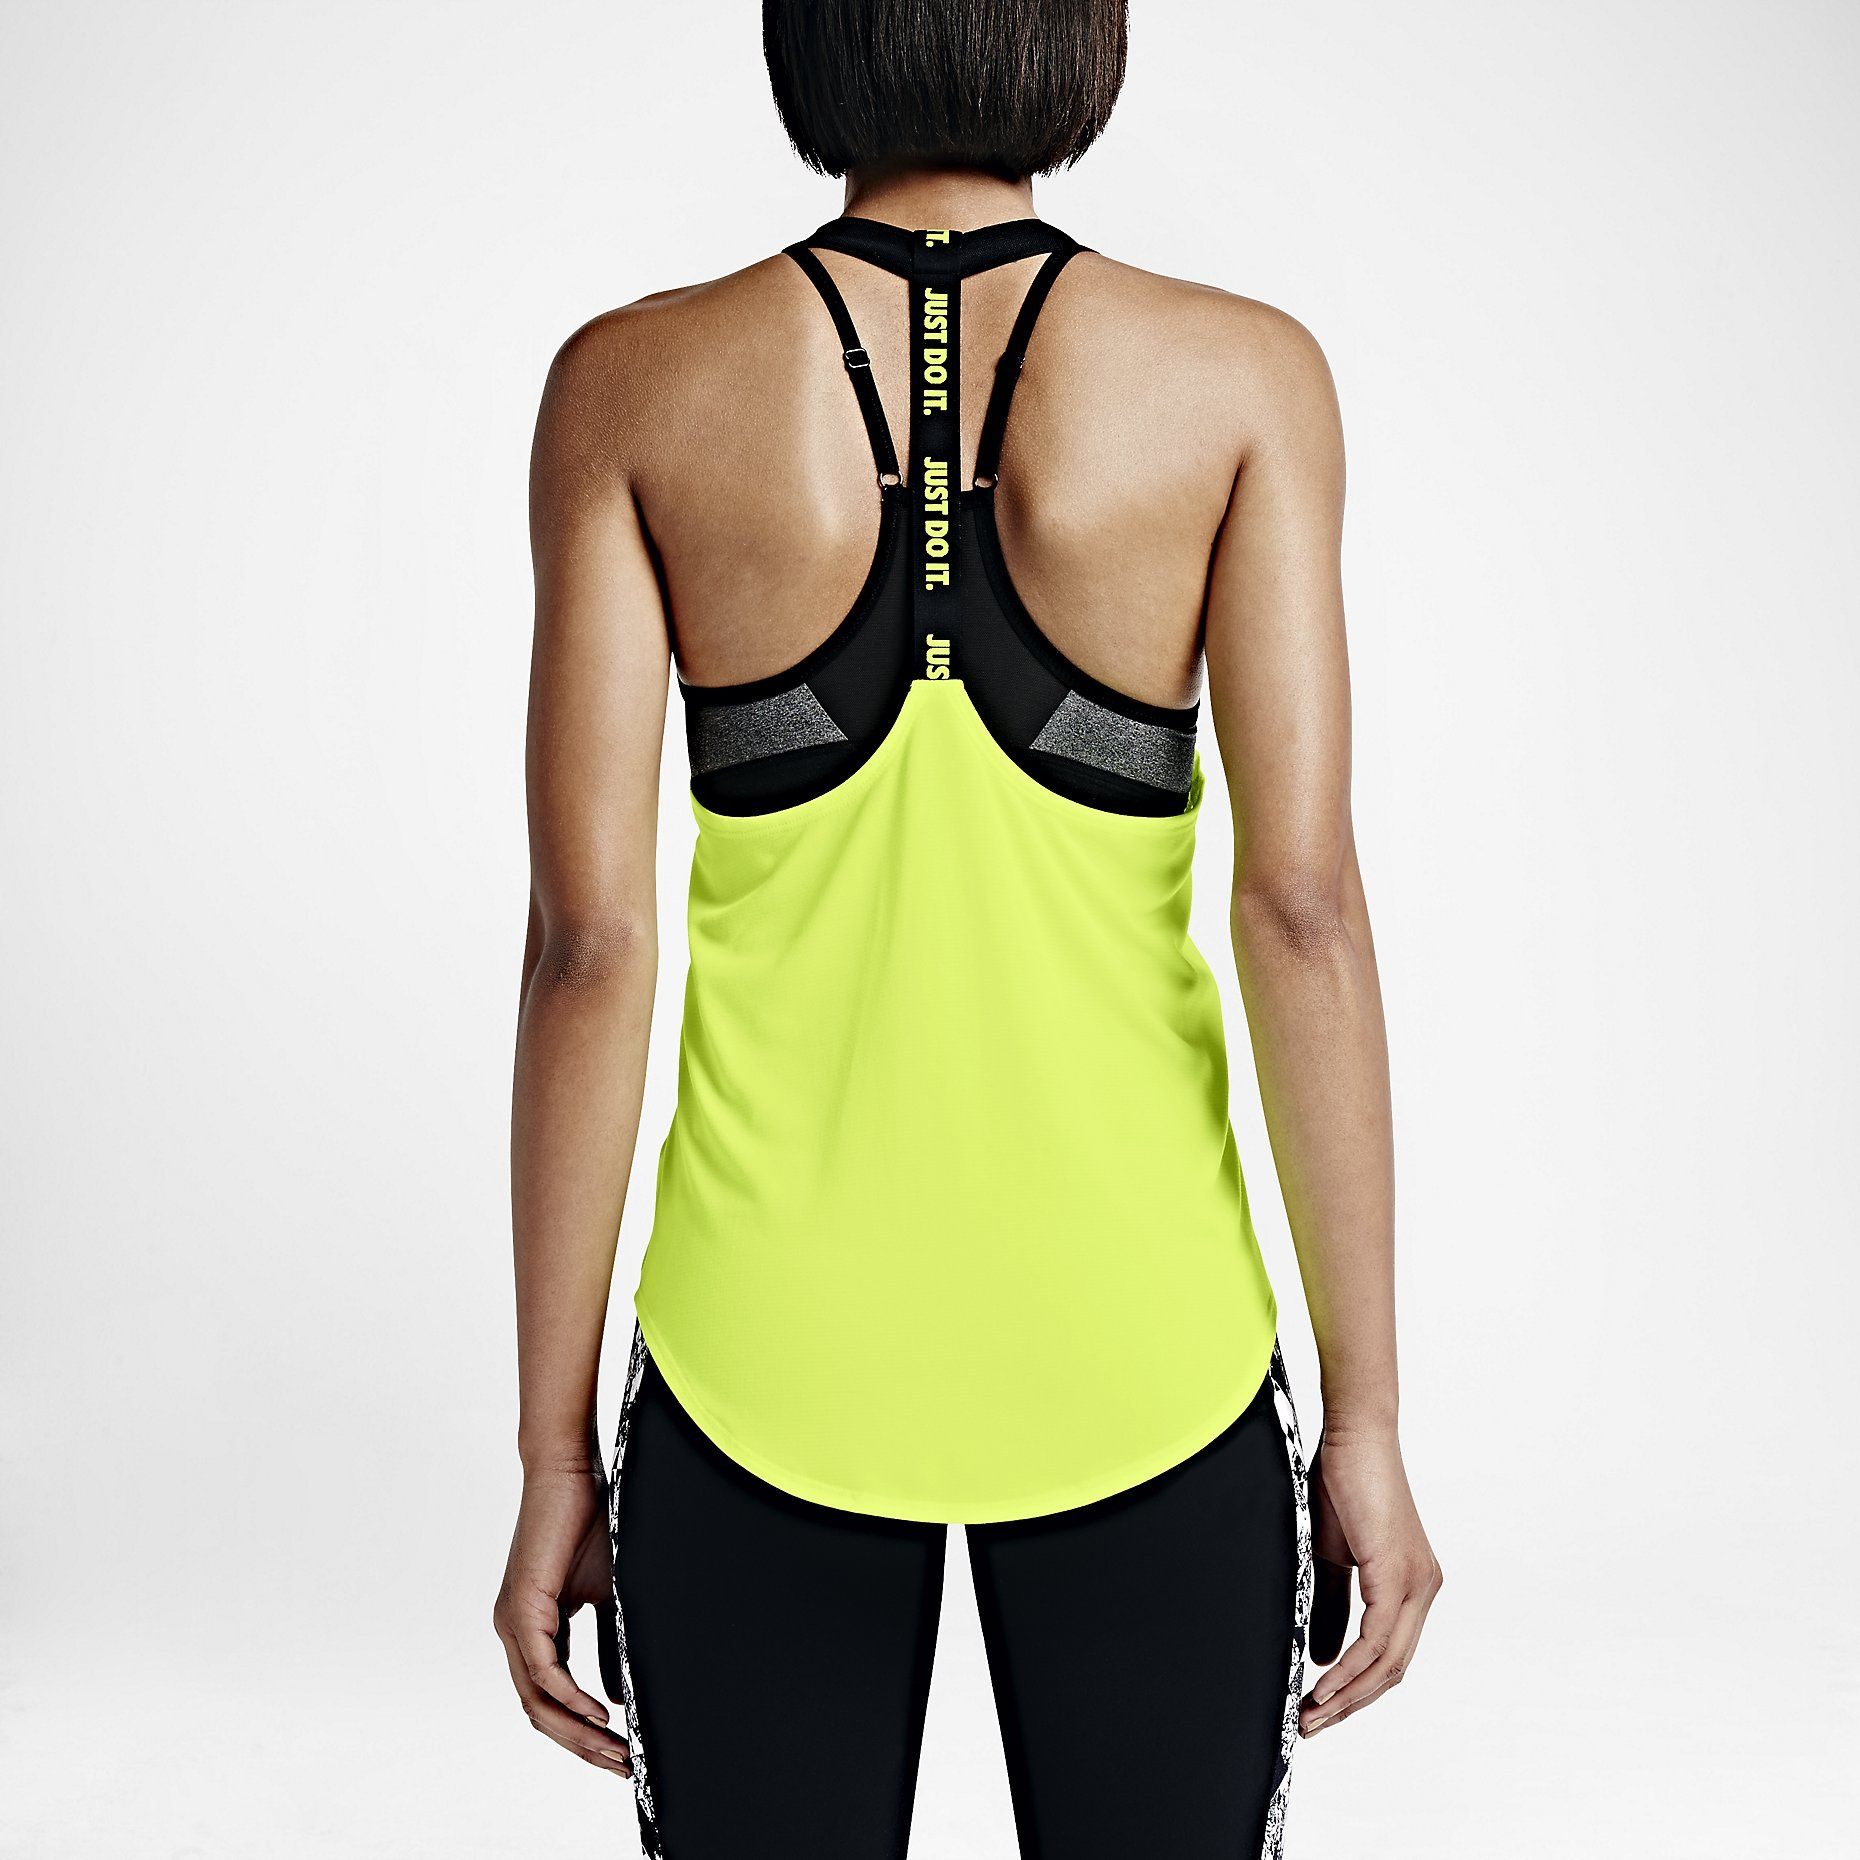 89eac1756bf23 Nike Elastika Graphic Women s Training Tank Top. Nike Store